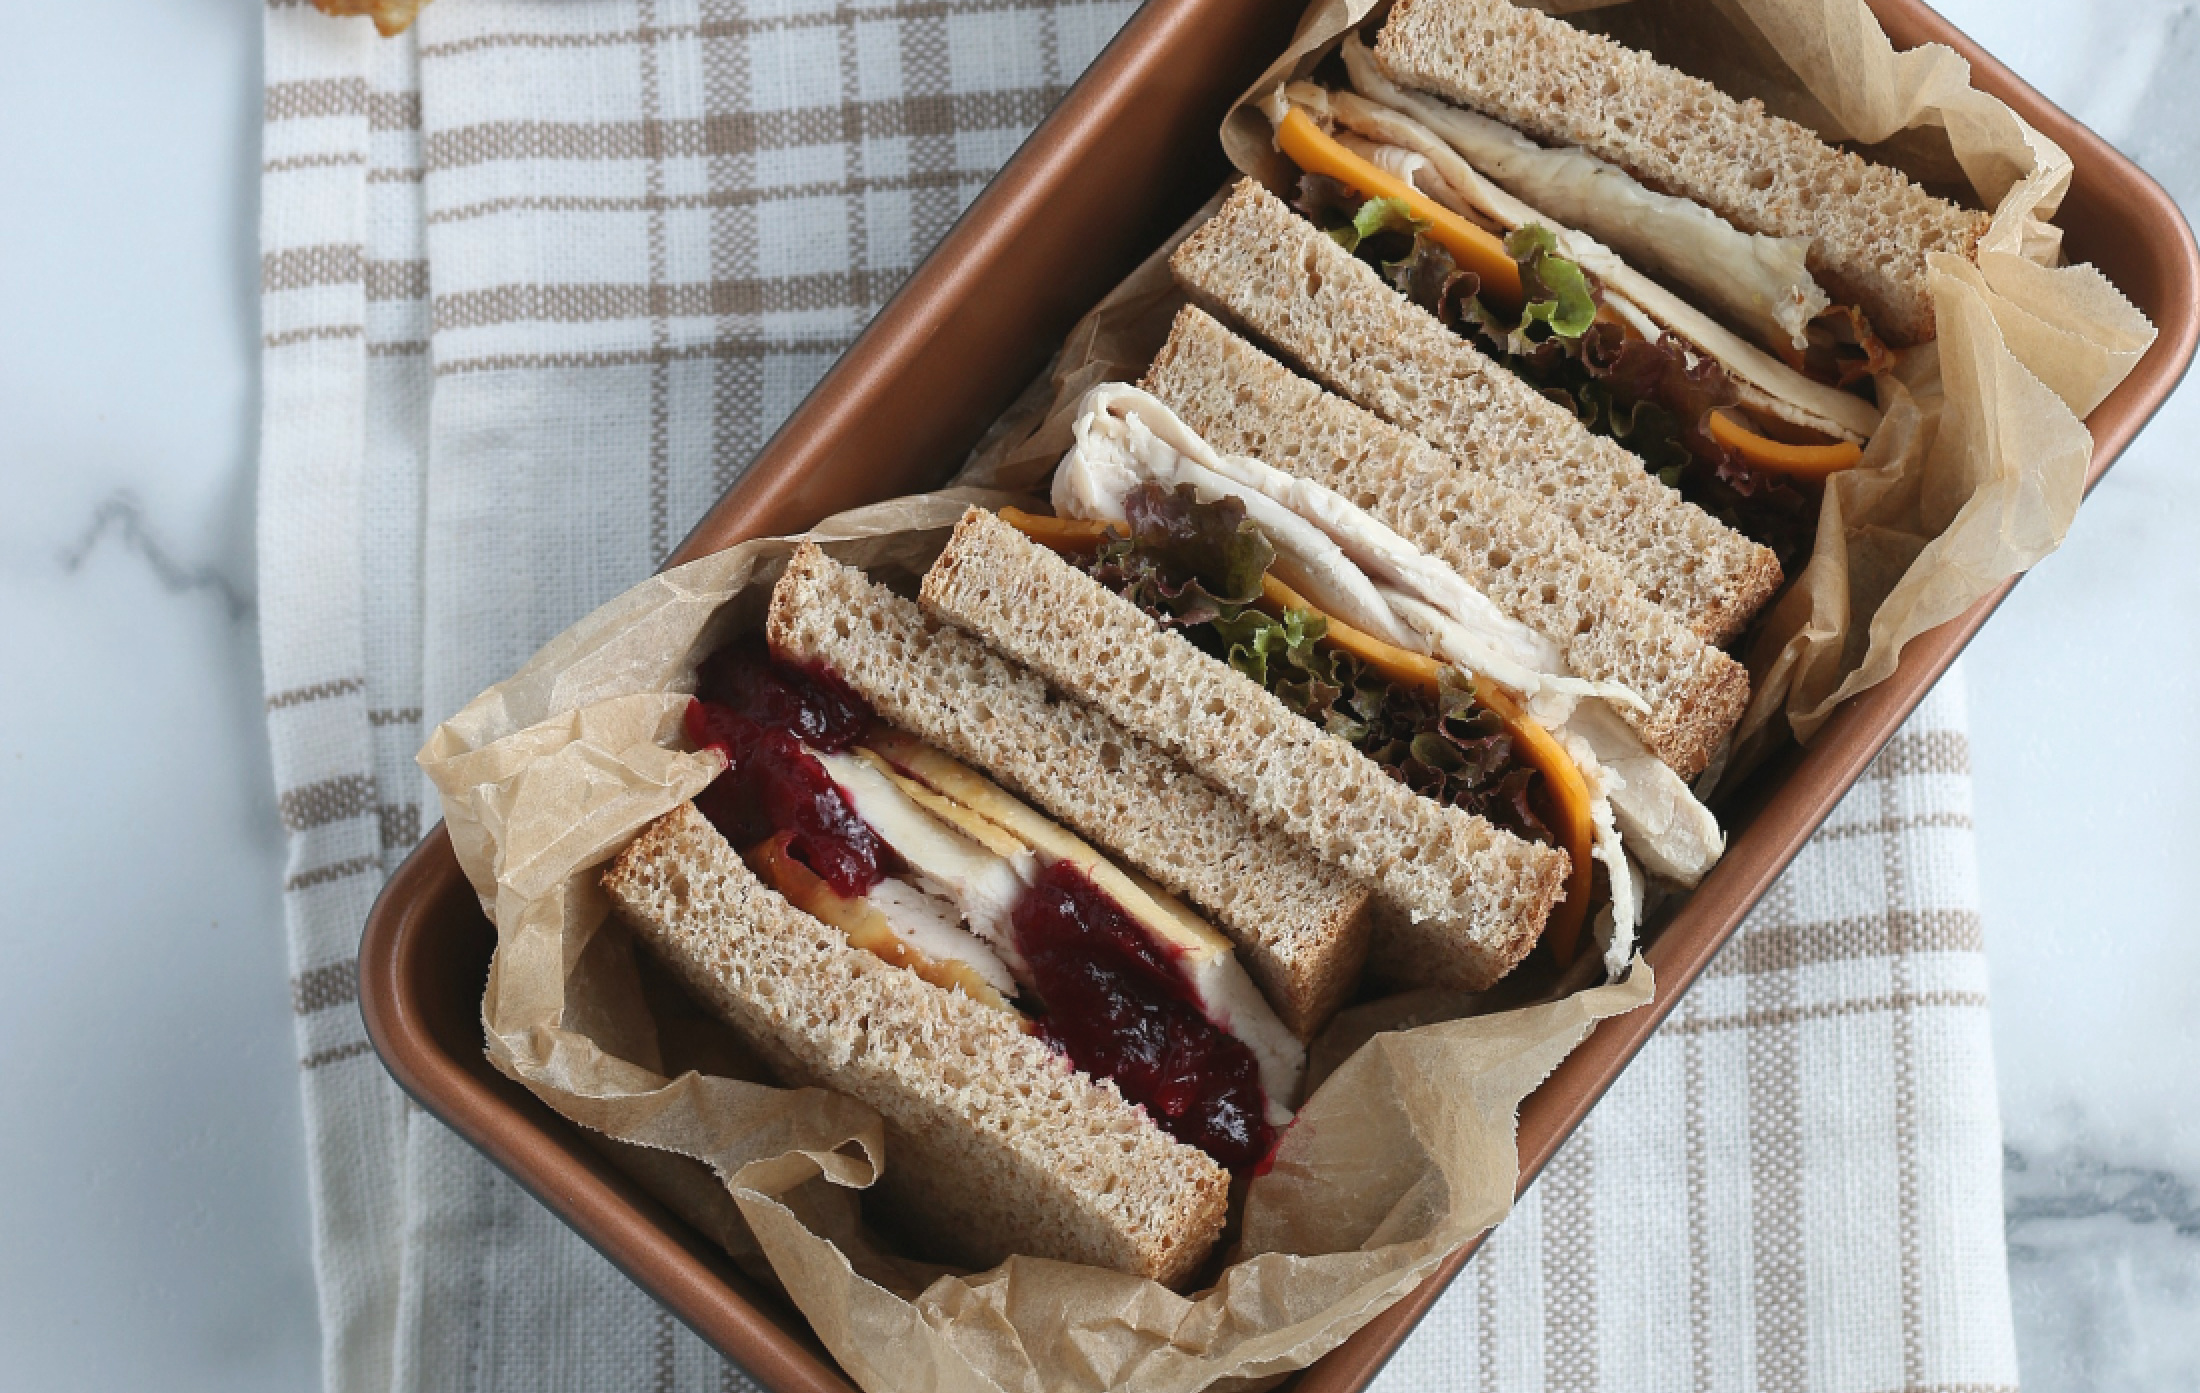 How to Make the Best Turkey Sandwich